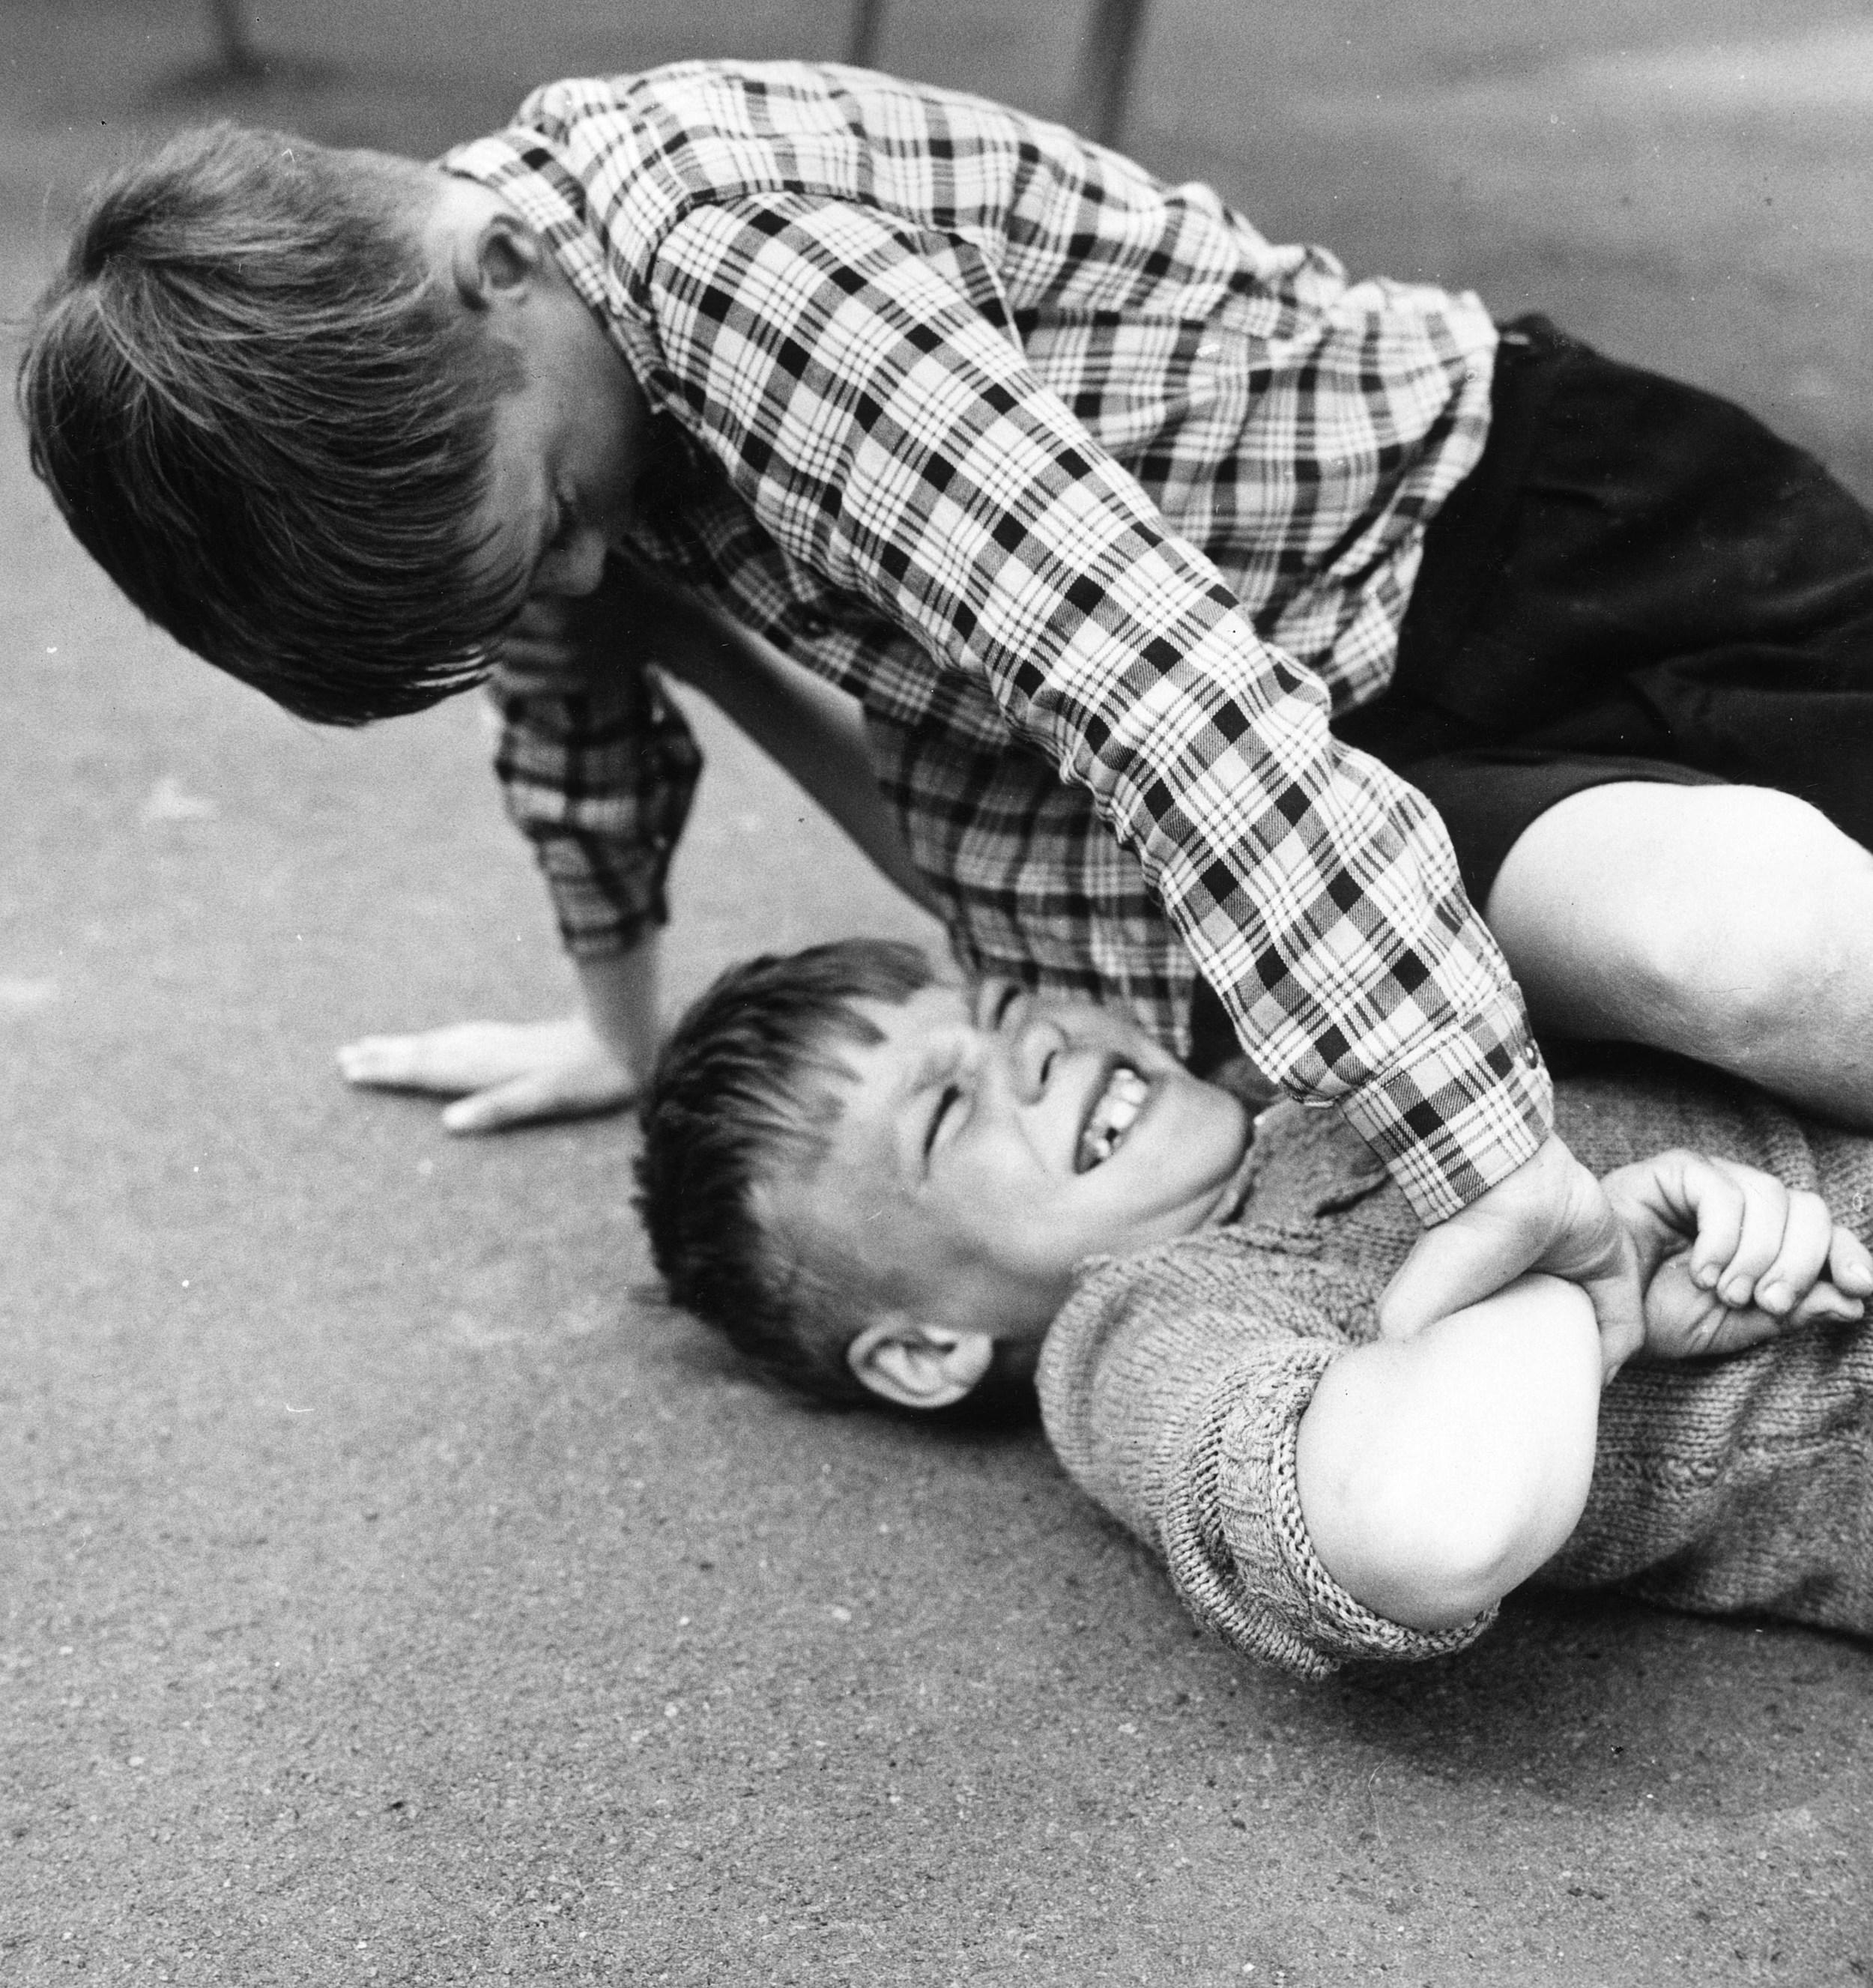 children fighting at school - photo #44